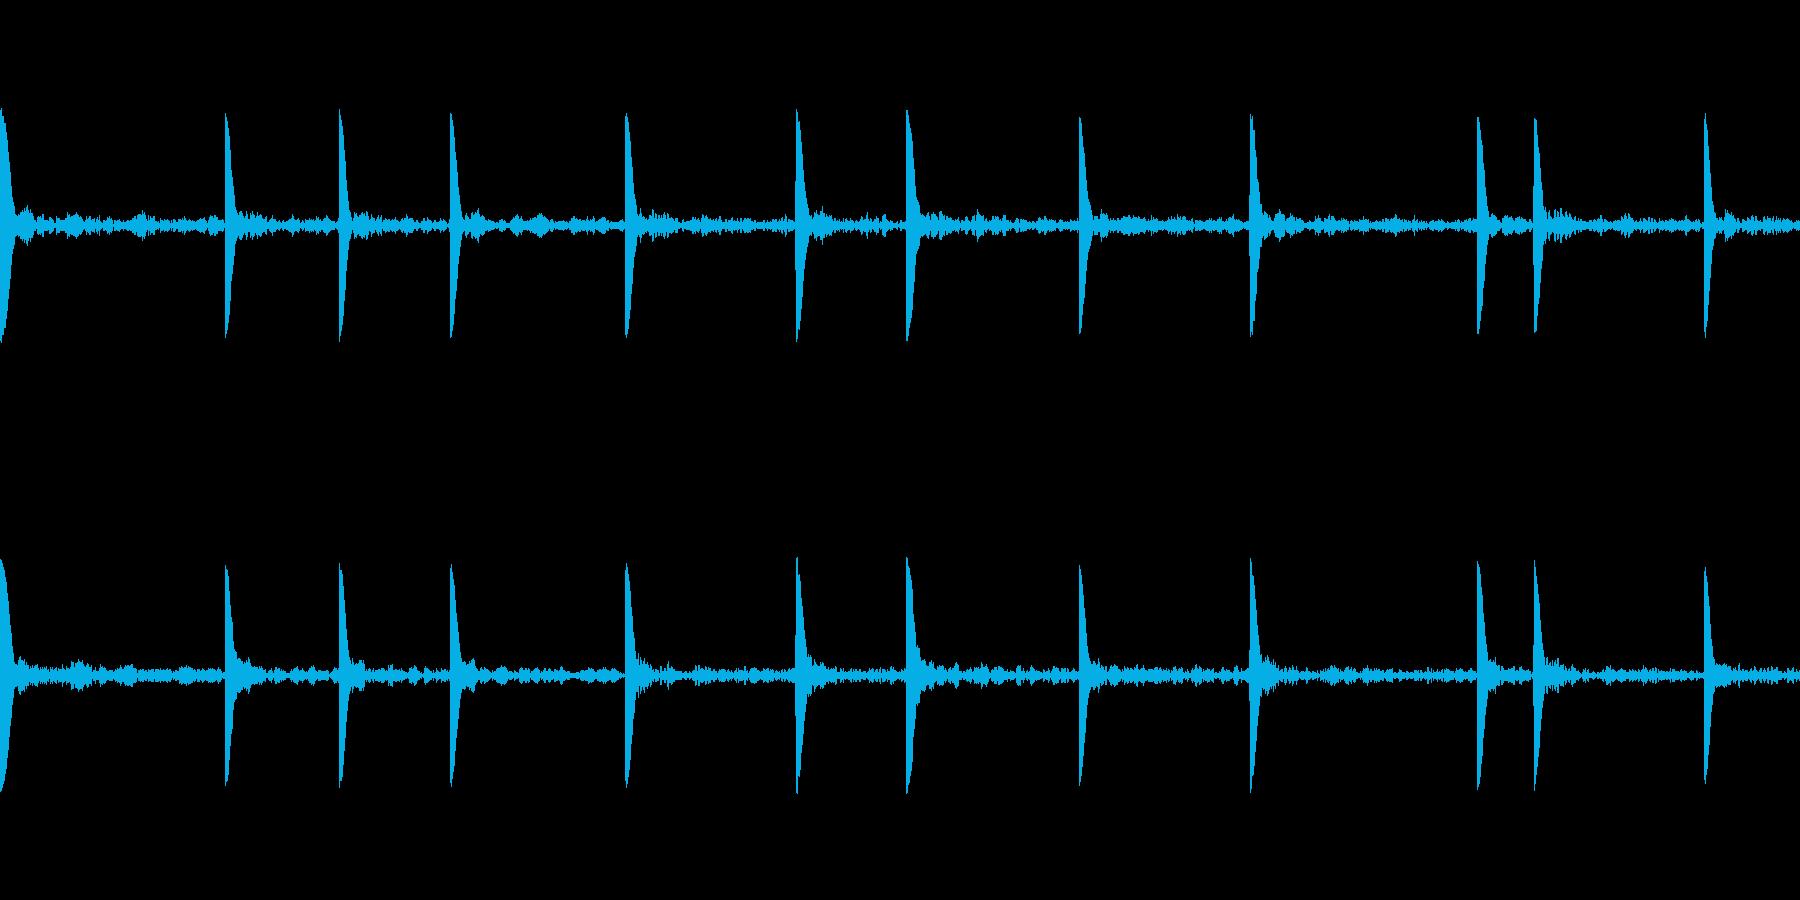 EDM PluckLoop3 音楽制作用の再生済みの波形